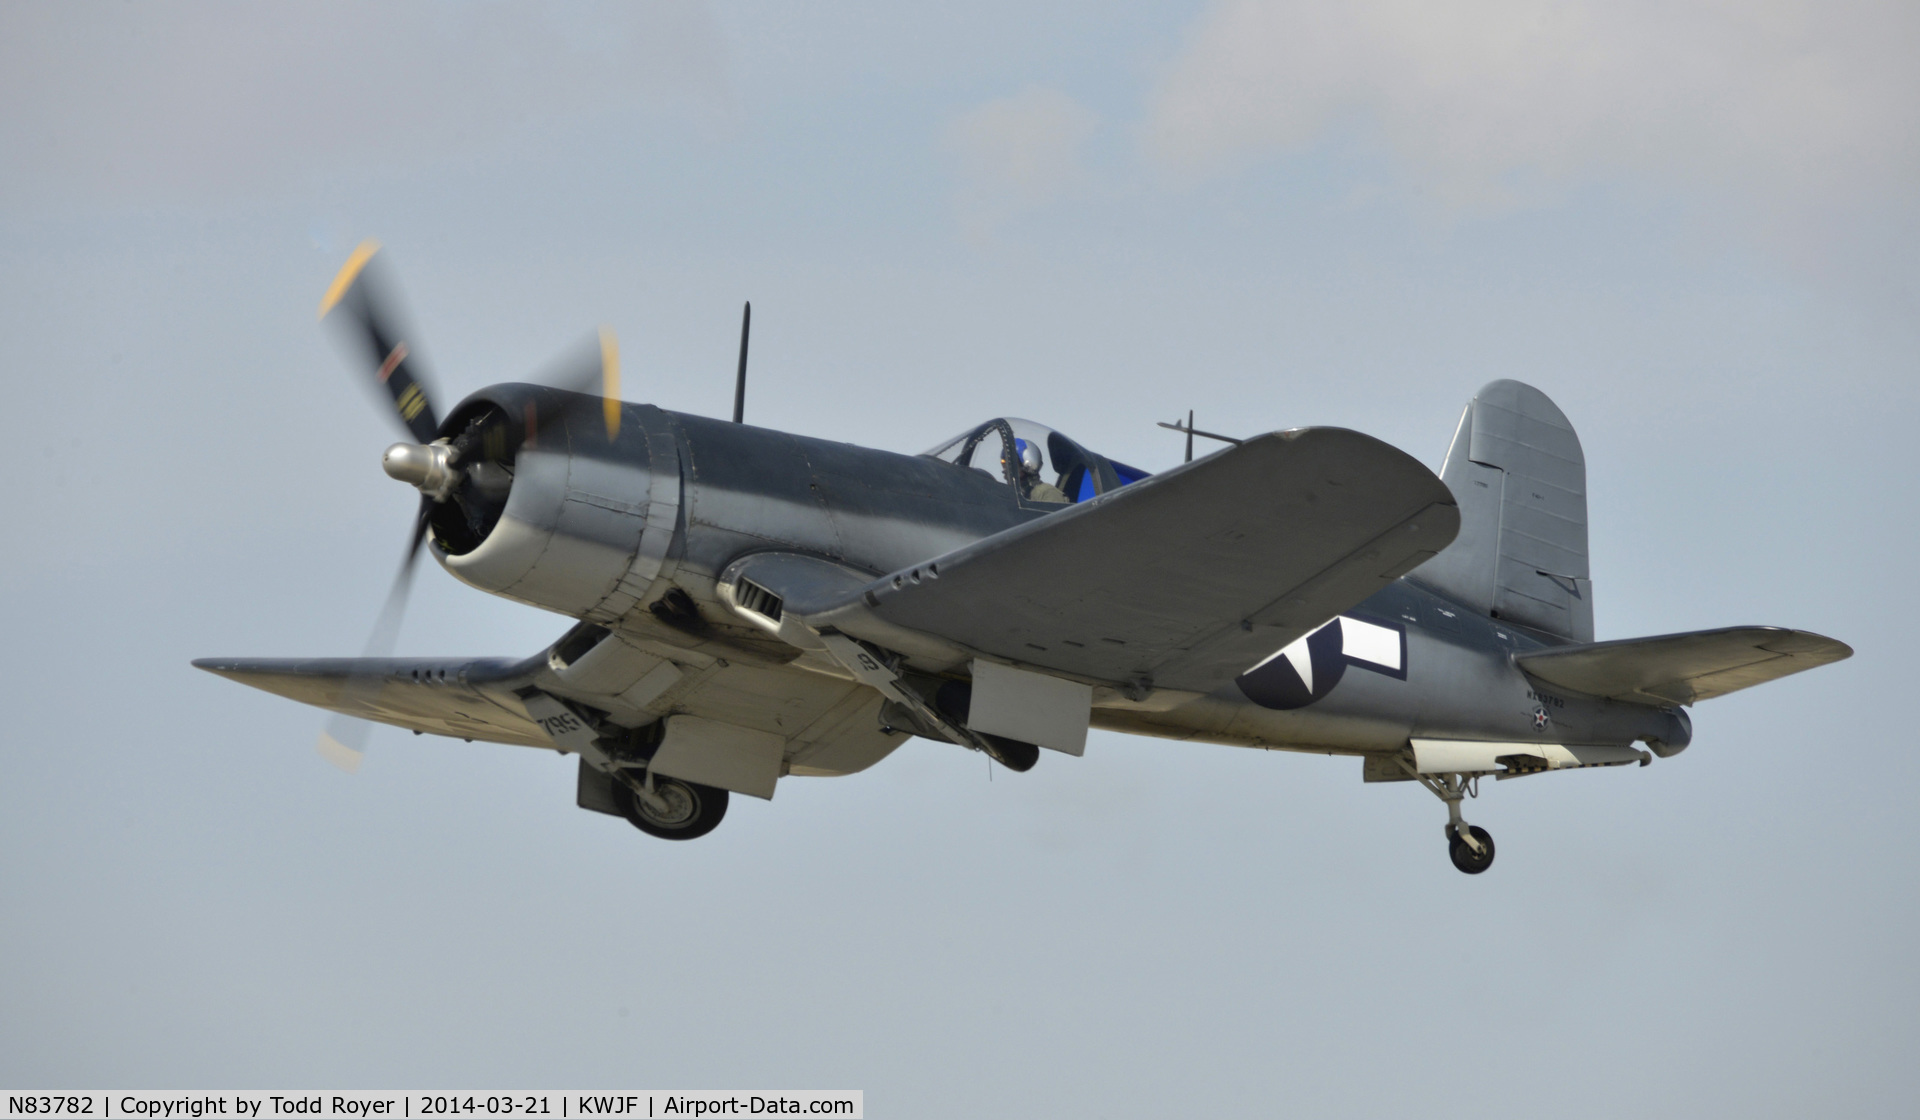 N83782, 1942 Vought F4U-1 Corsair C/N 3884 (Bu 17799), Departing Fox Field Lancaster California